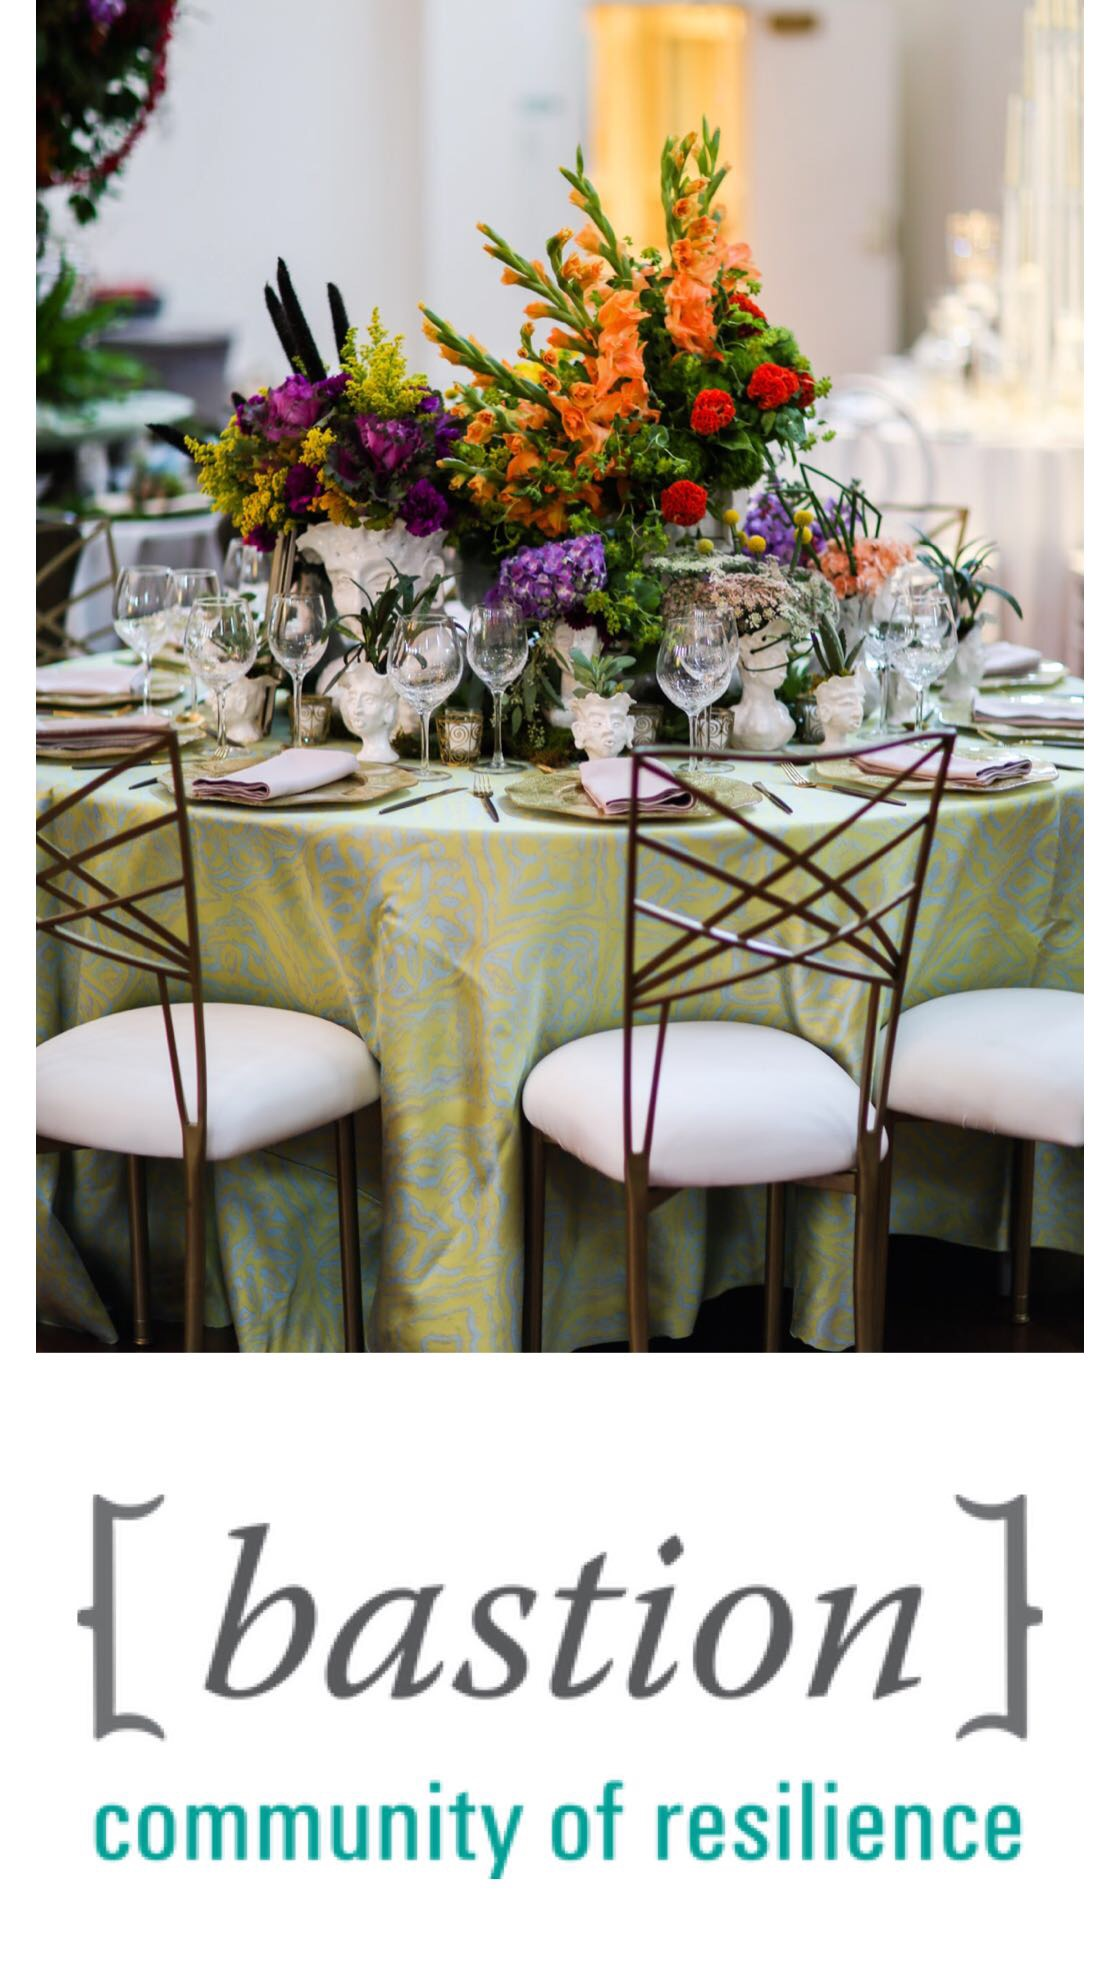 St. Charles Wine Dine Design Event